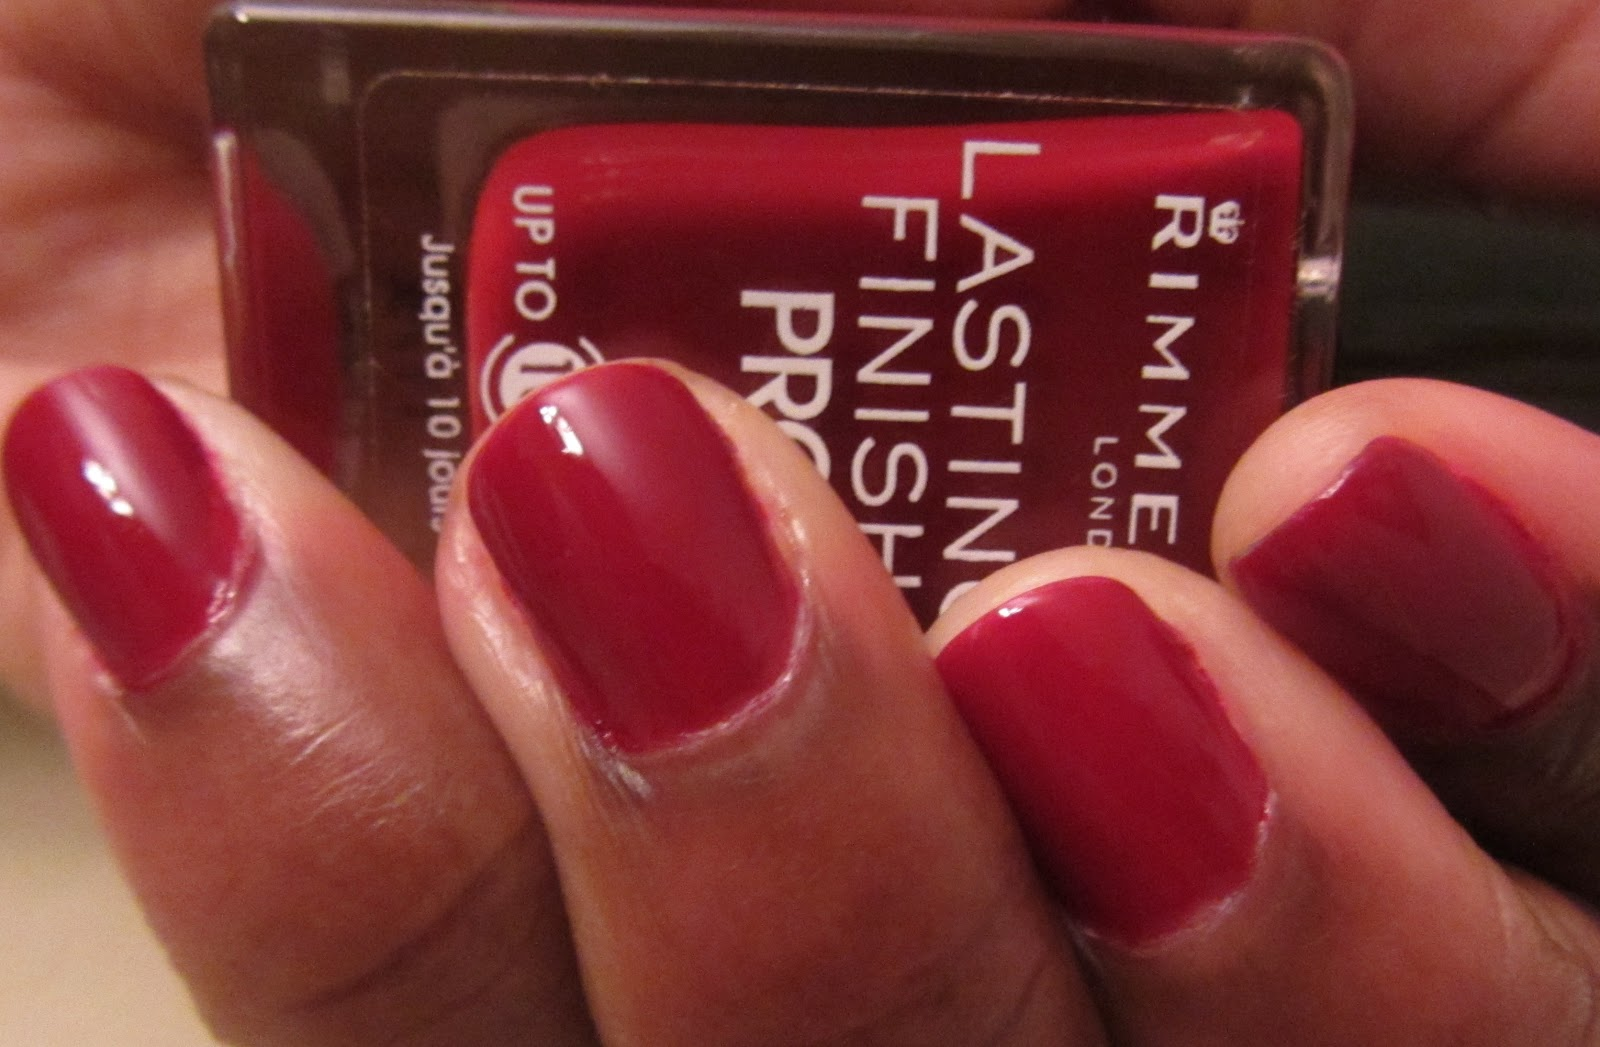 Kikistyles: Rimmel London Pro Nail Polish Burgundy Flirt Review and ...